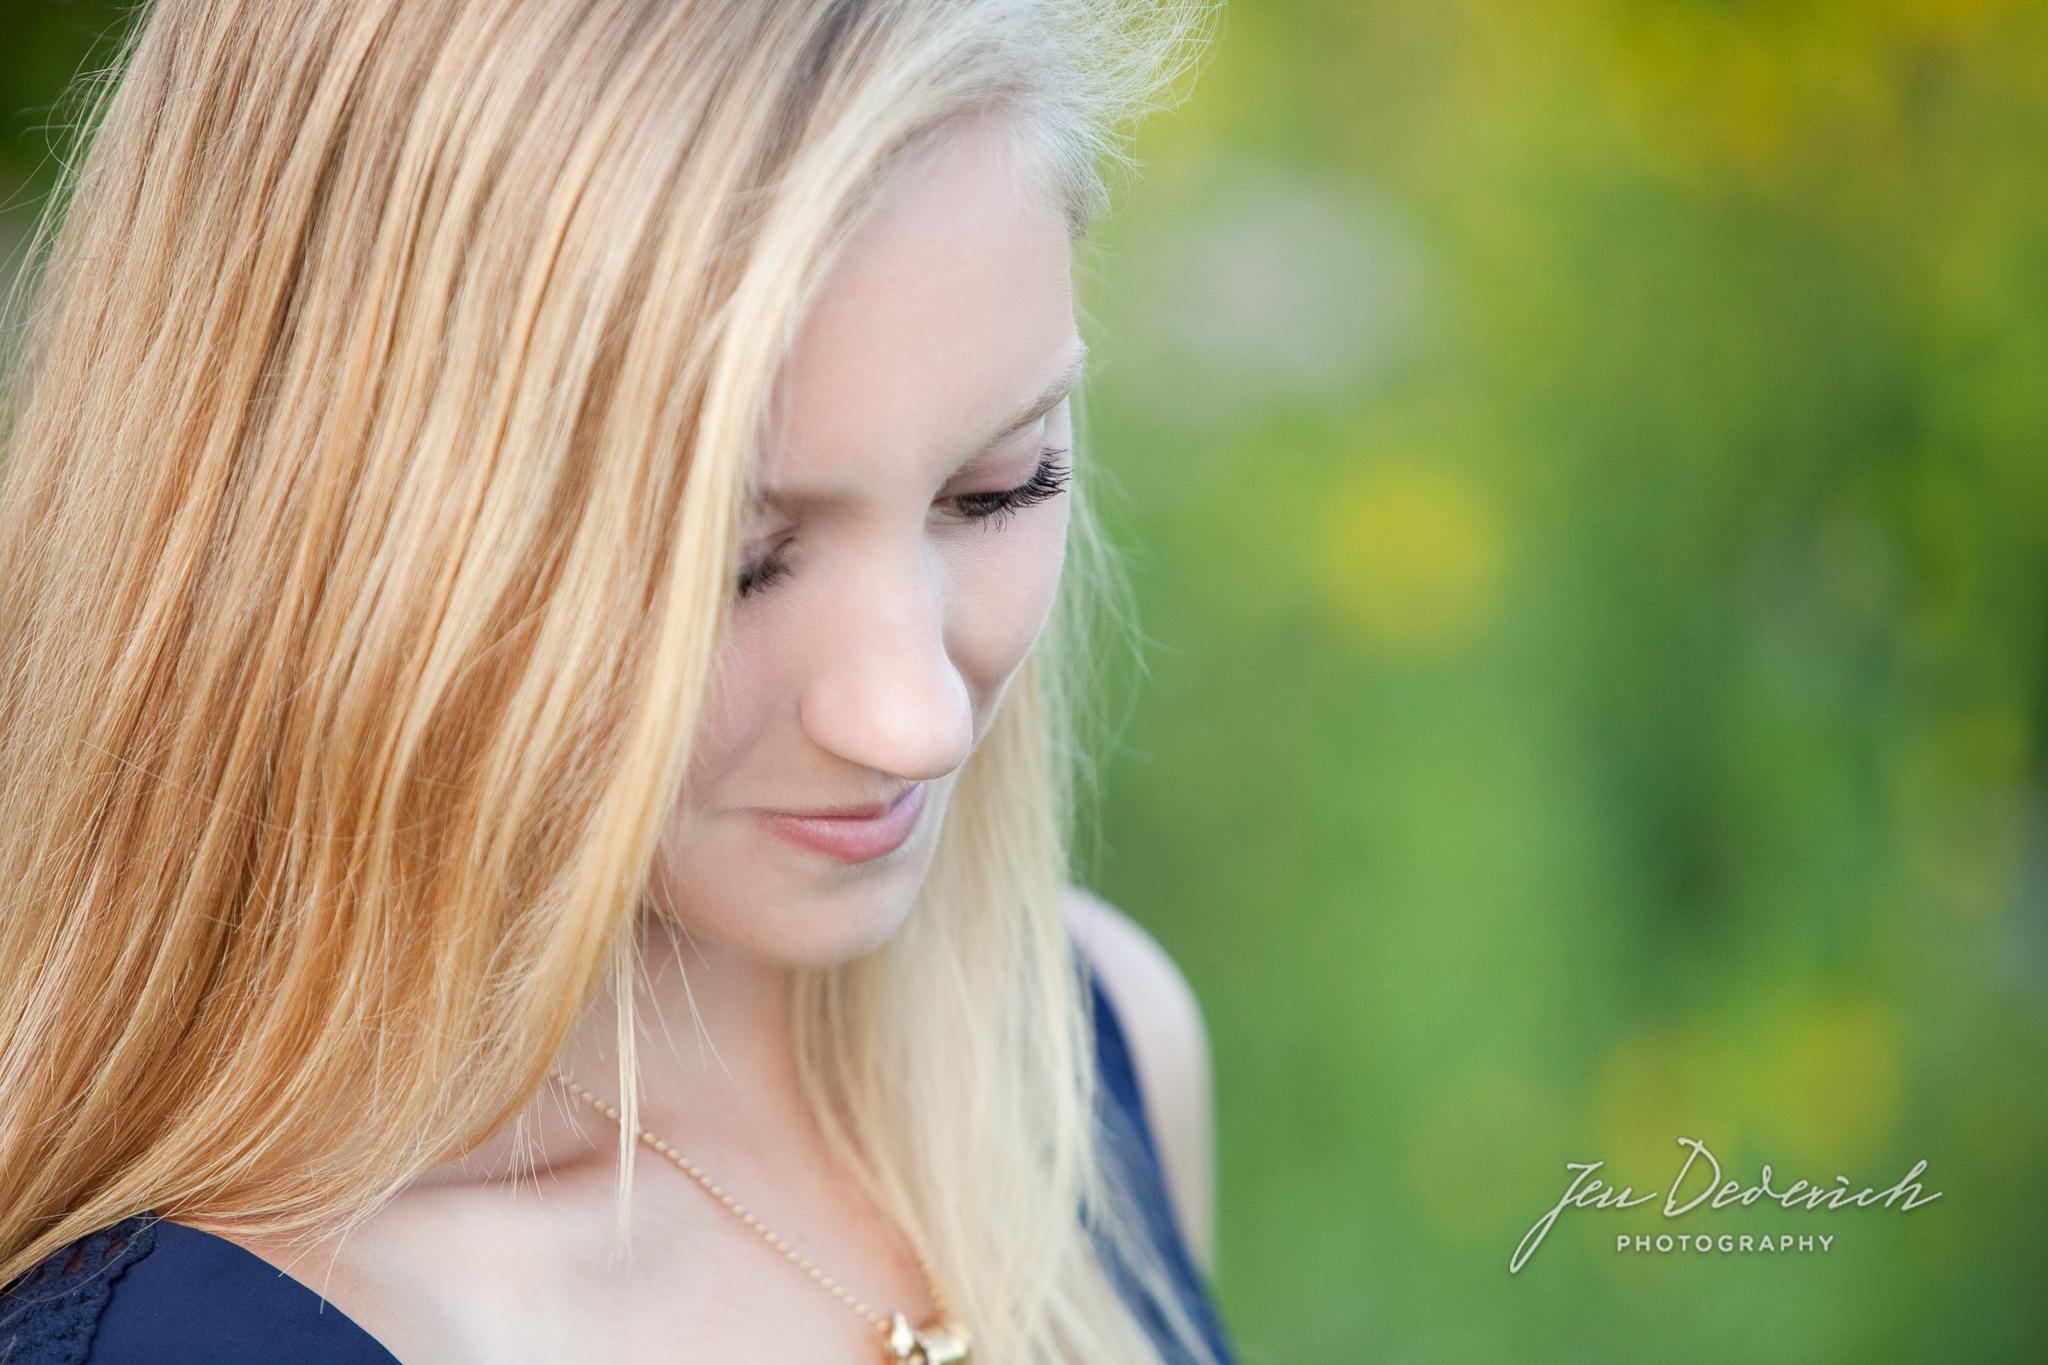 Senior_Madison WI_Jen Dederich Photography_008.jpg